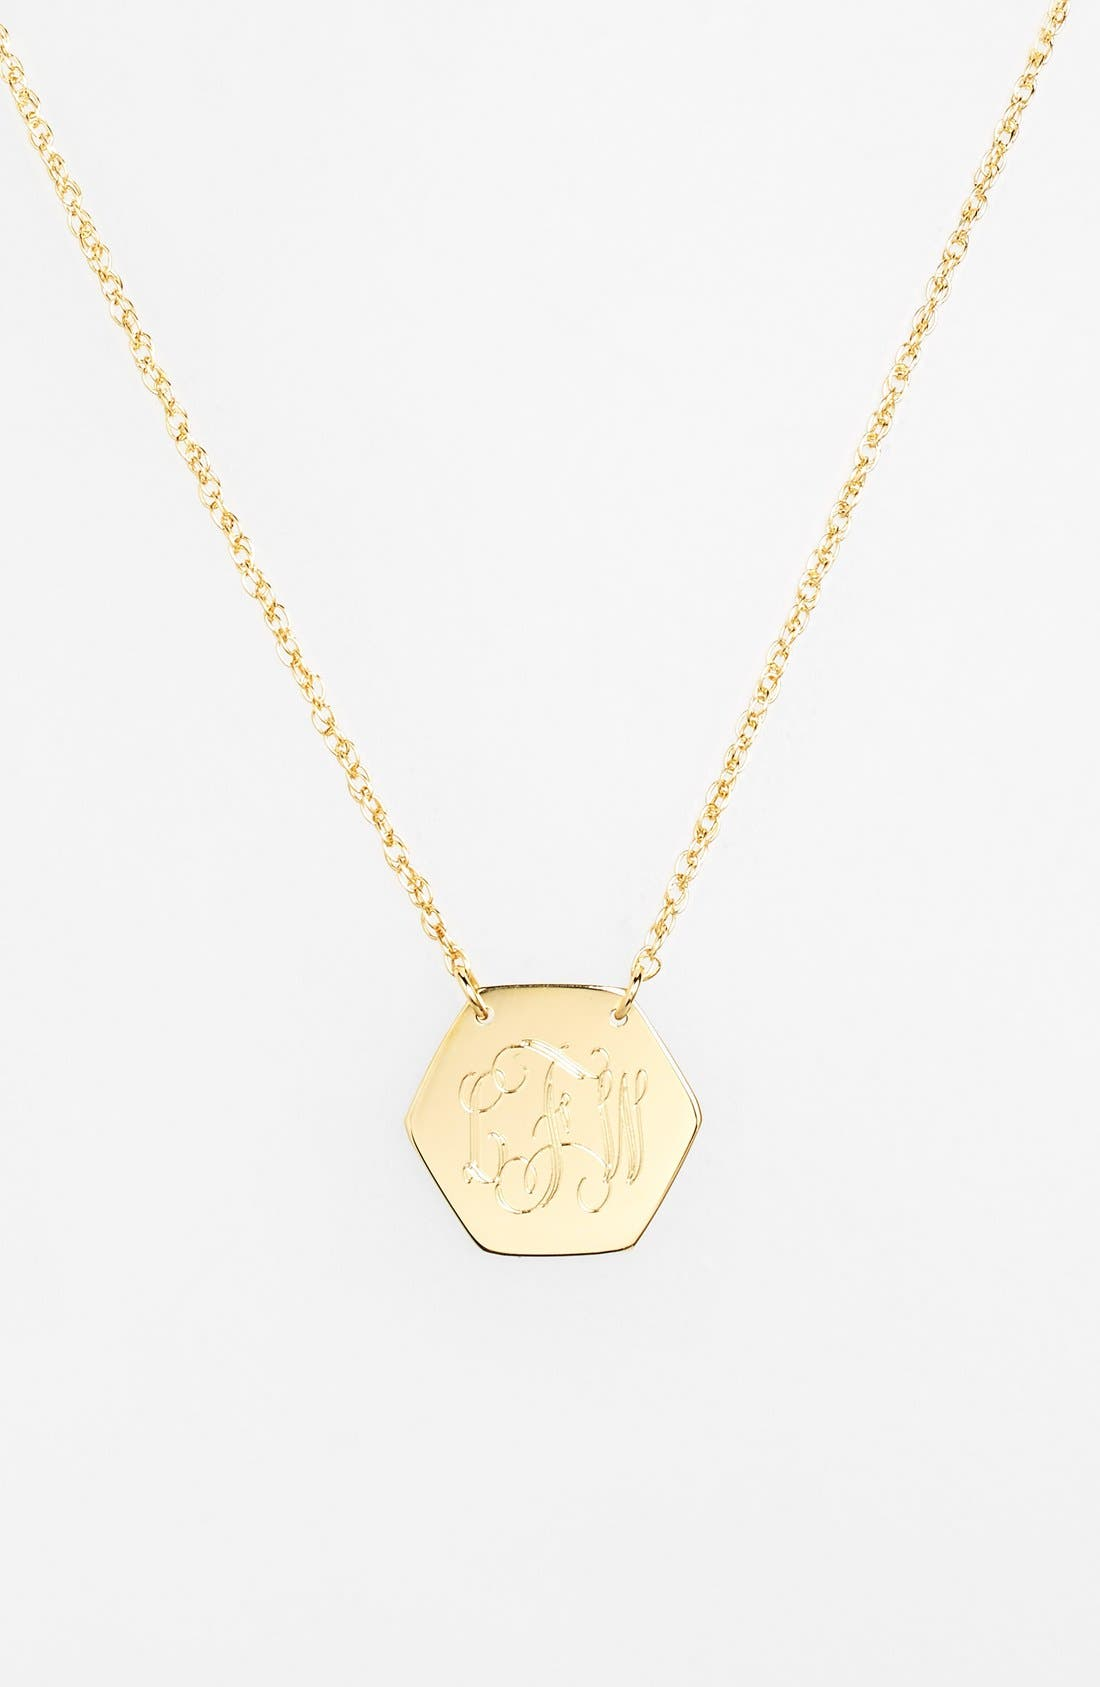 Personalized Hexagon Pendant Necklace,                             Alternate thumbnail 6, color,                             GOLD